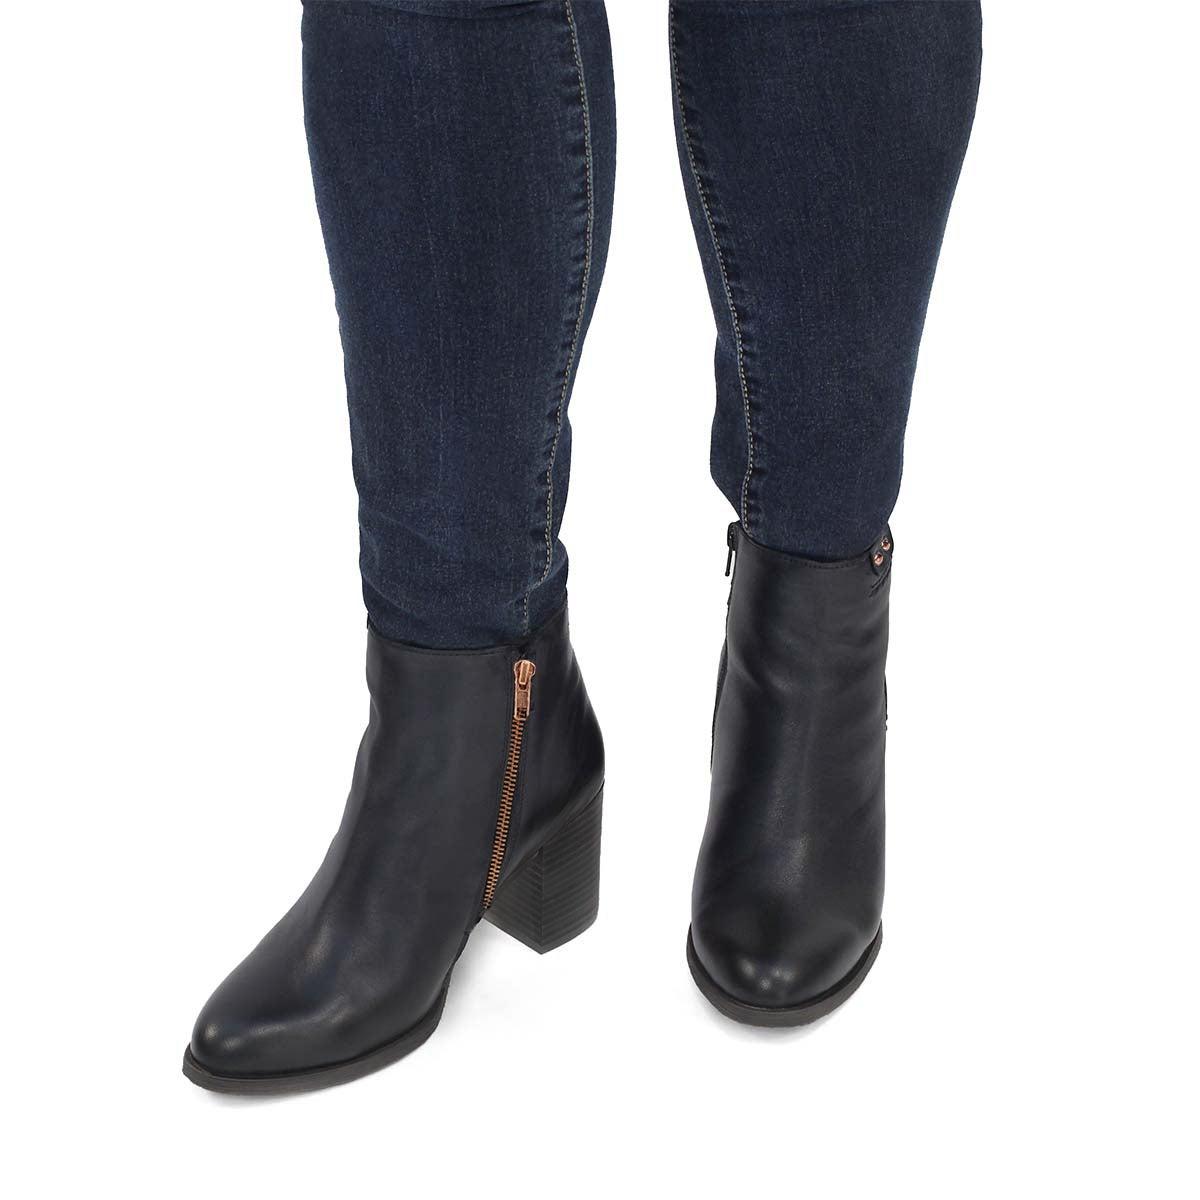 Women's DACIA blk/gld side zip ankle booties